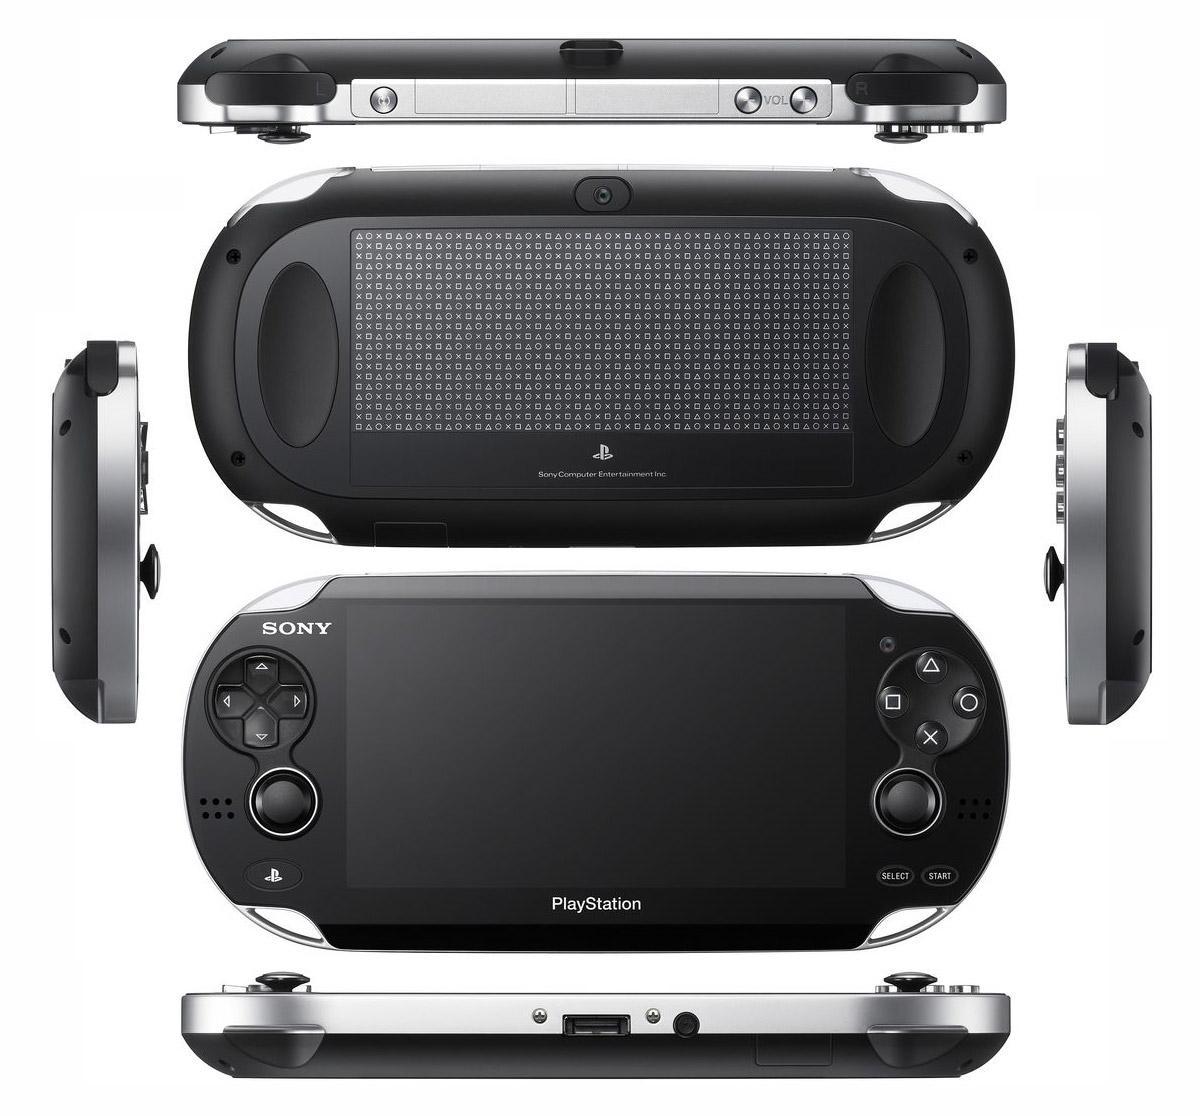 Playstation-Vita.jpg 1,200×1,116 pixels